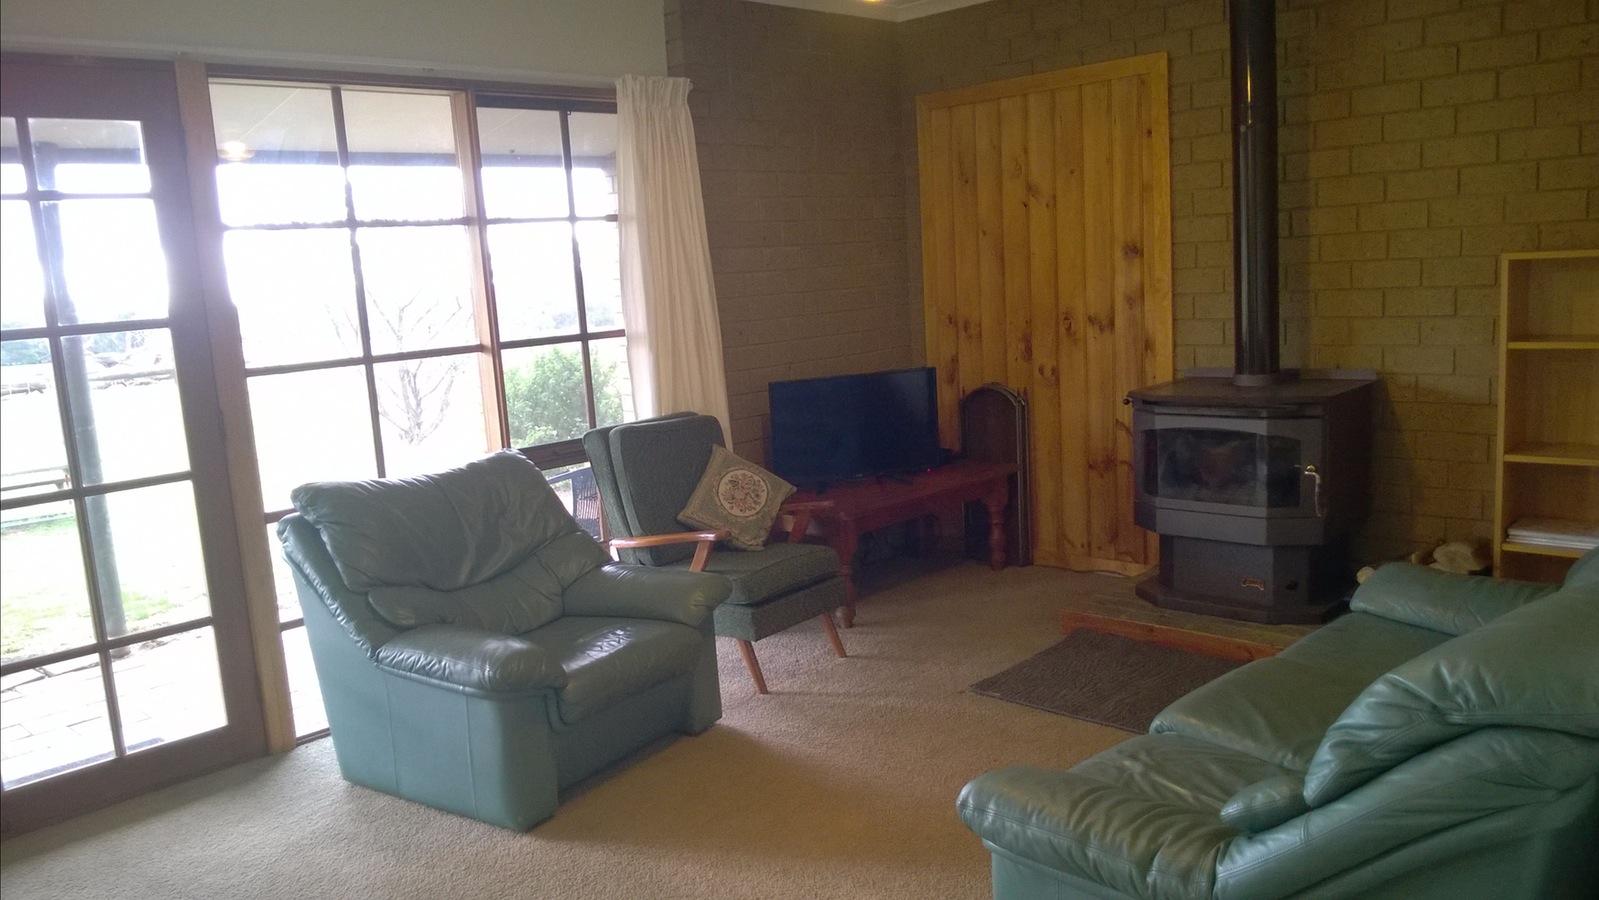 3 bedroom lounge